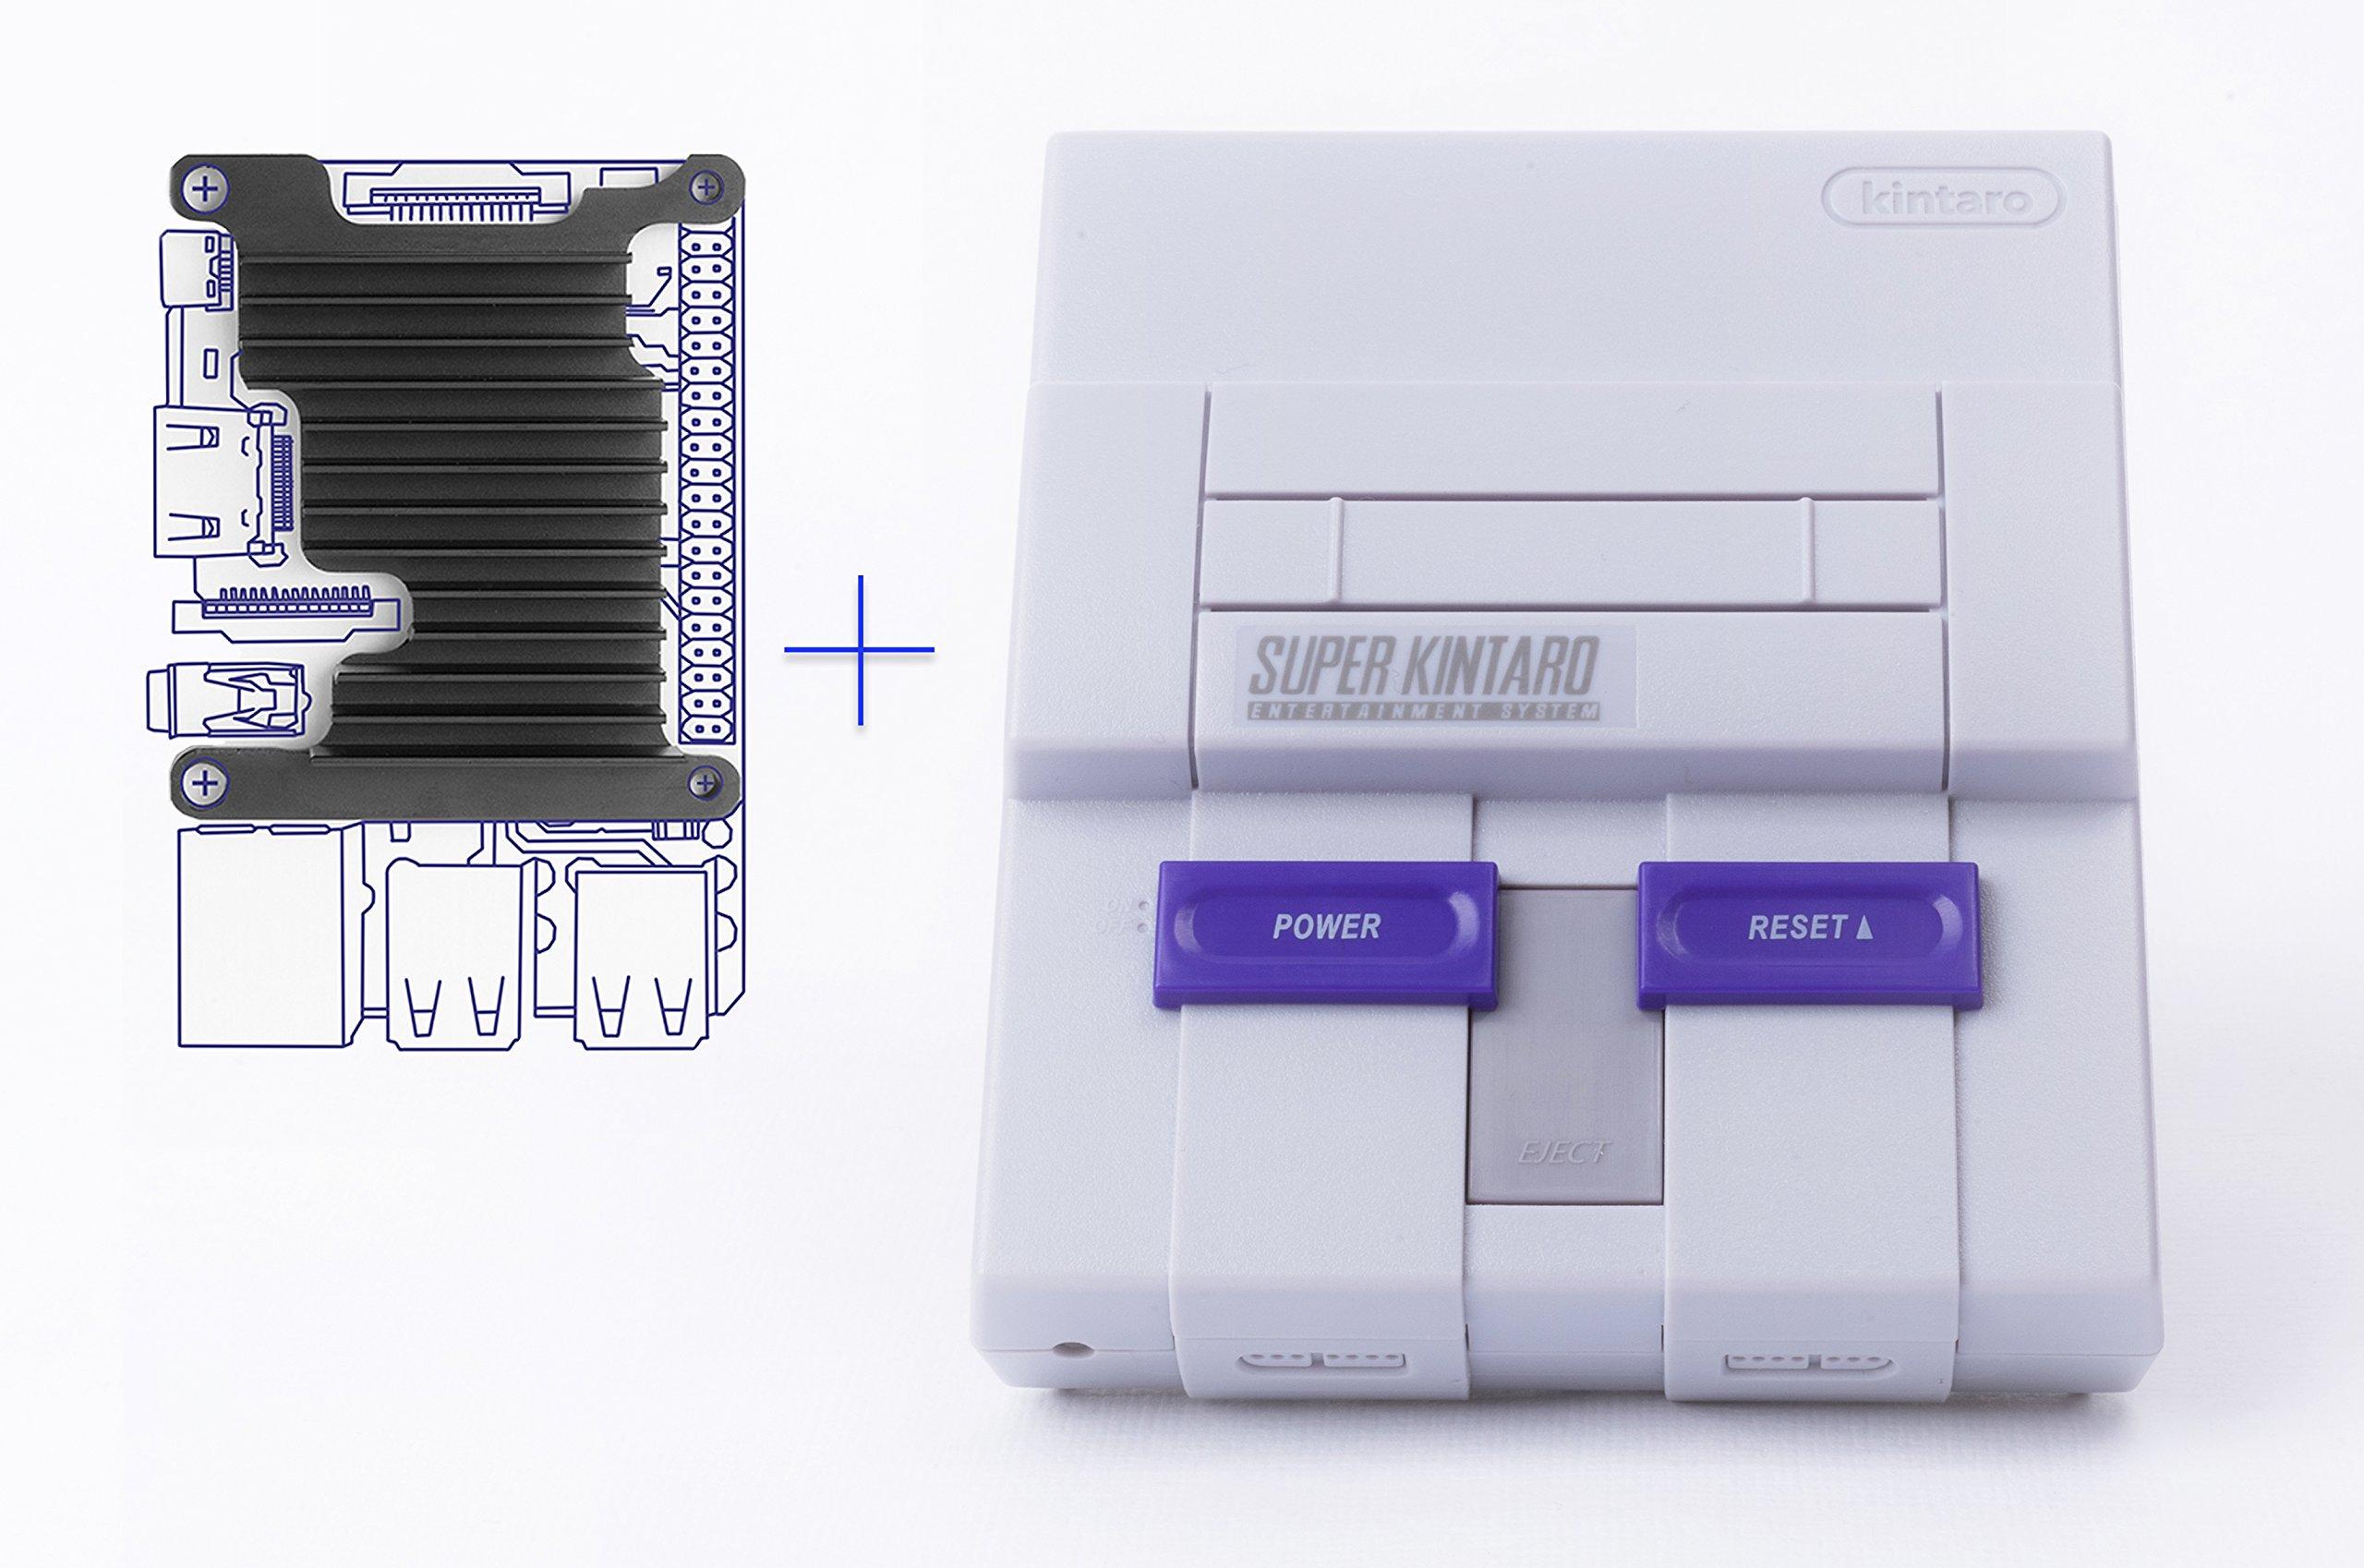 Kintaro Super Kuma 9000 - SNES Inspired Raspberry Pi Case with Functional Power & Reset Buttons, LED and Custom Aluminum Heatsink (Raspberry Pi Model 3B) by Kintaro (Image #1)